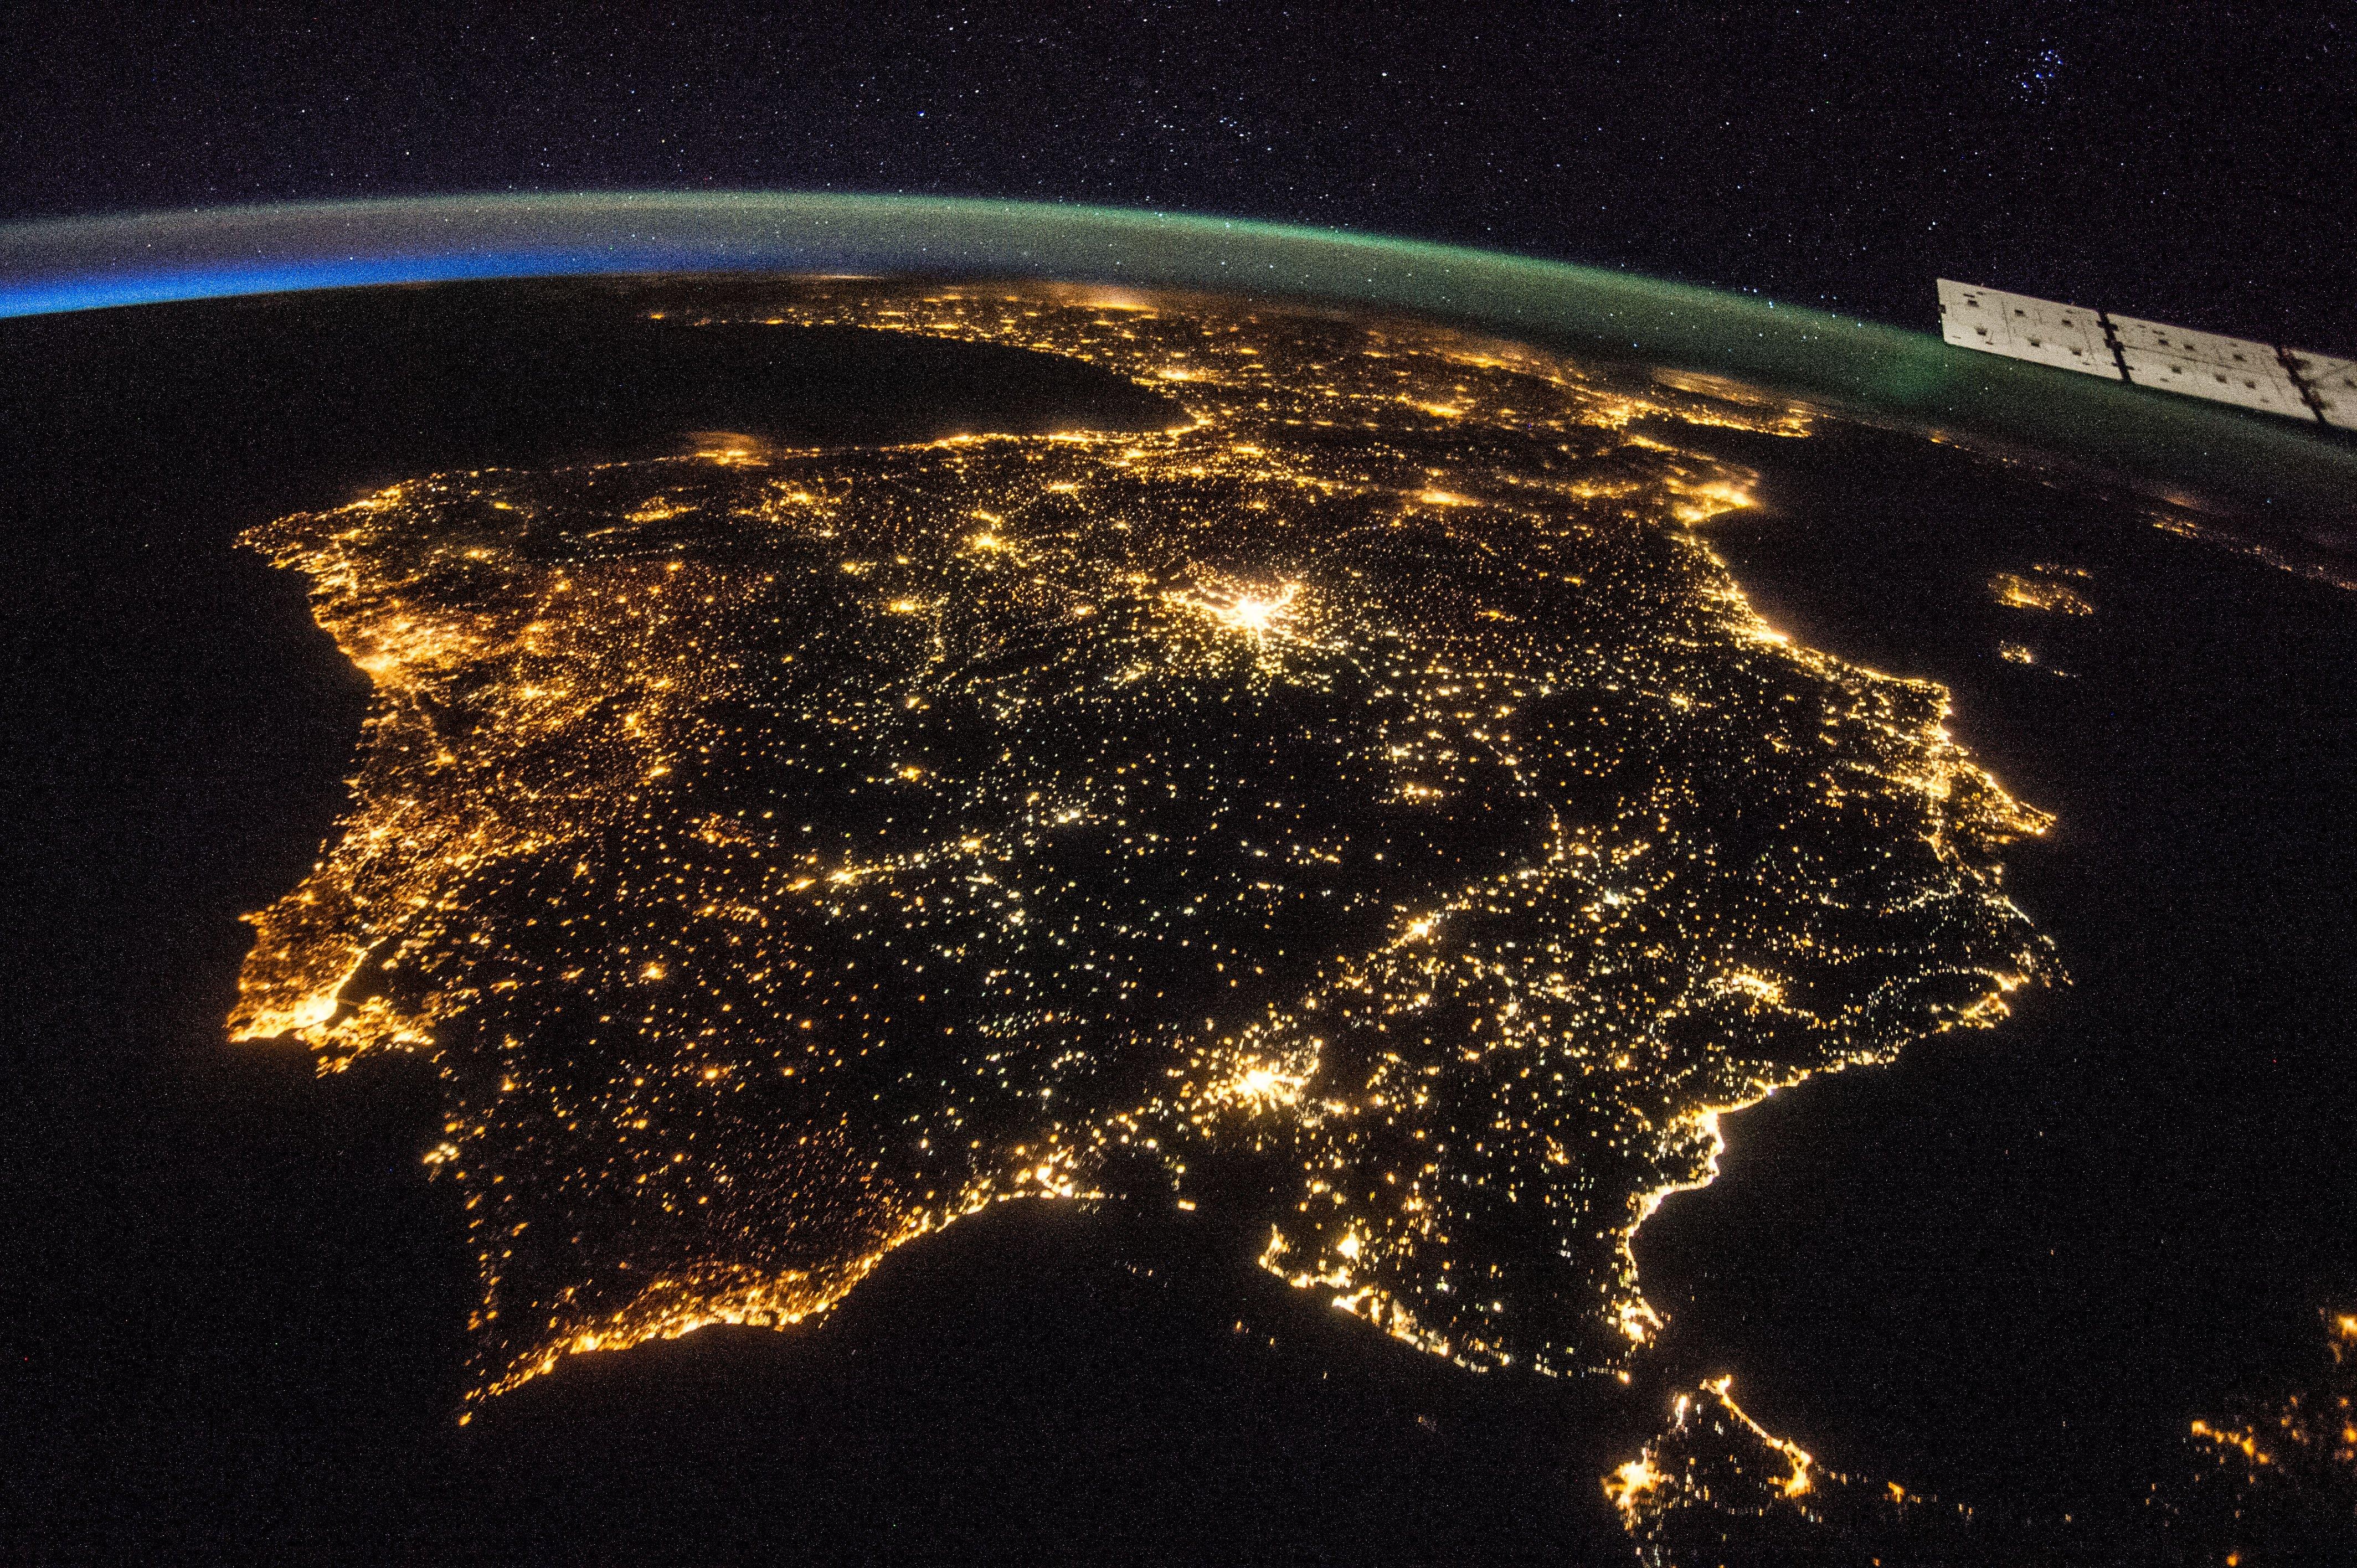 spain-europe-from-space-at-night-nasa.jpg